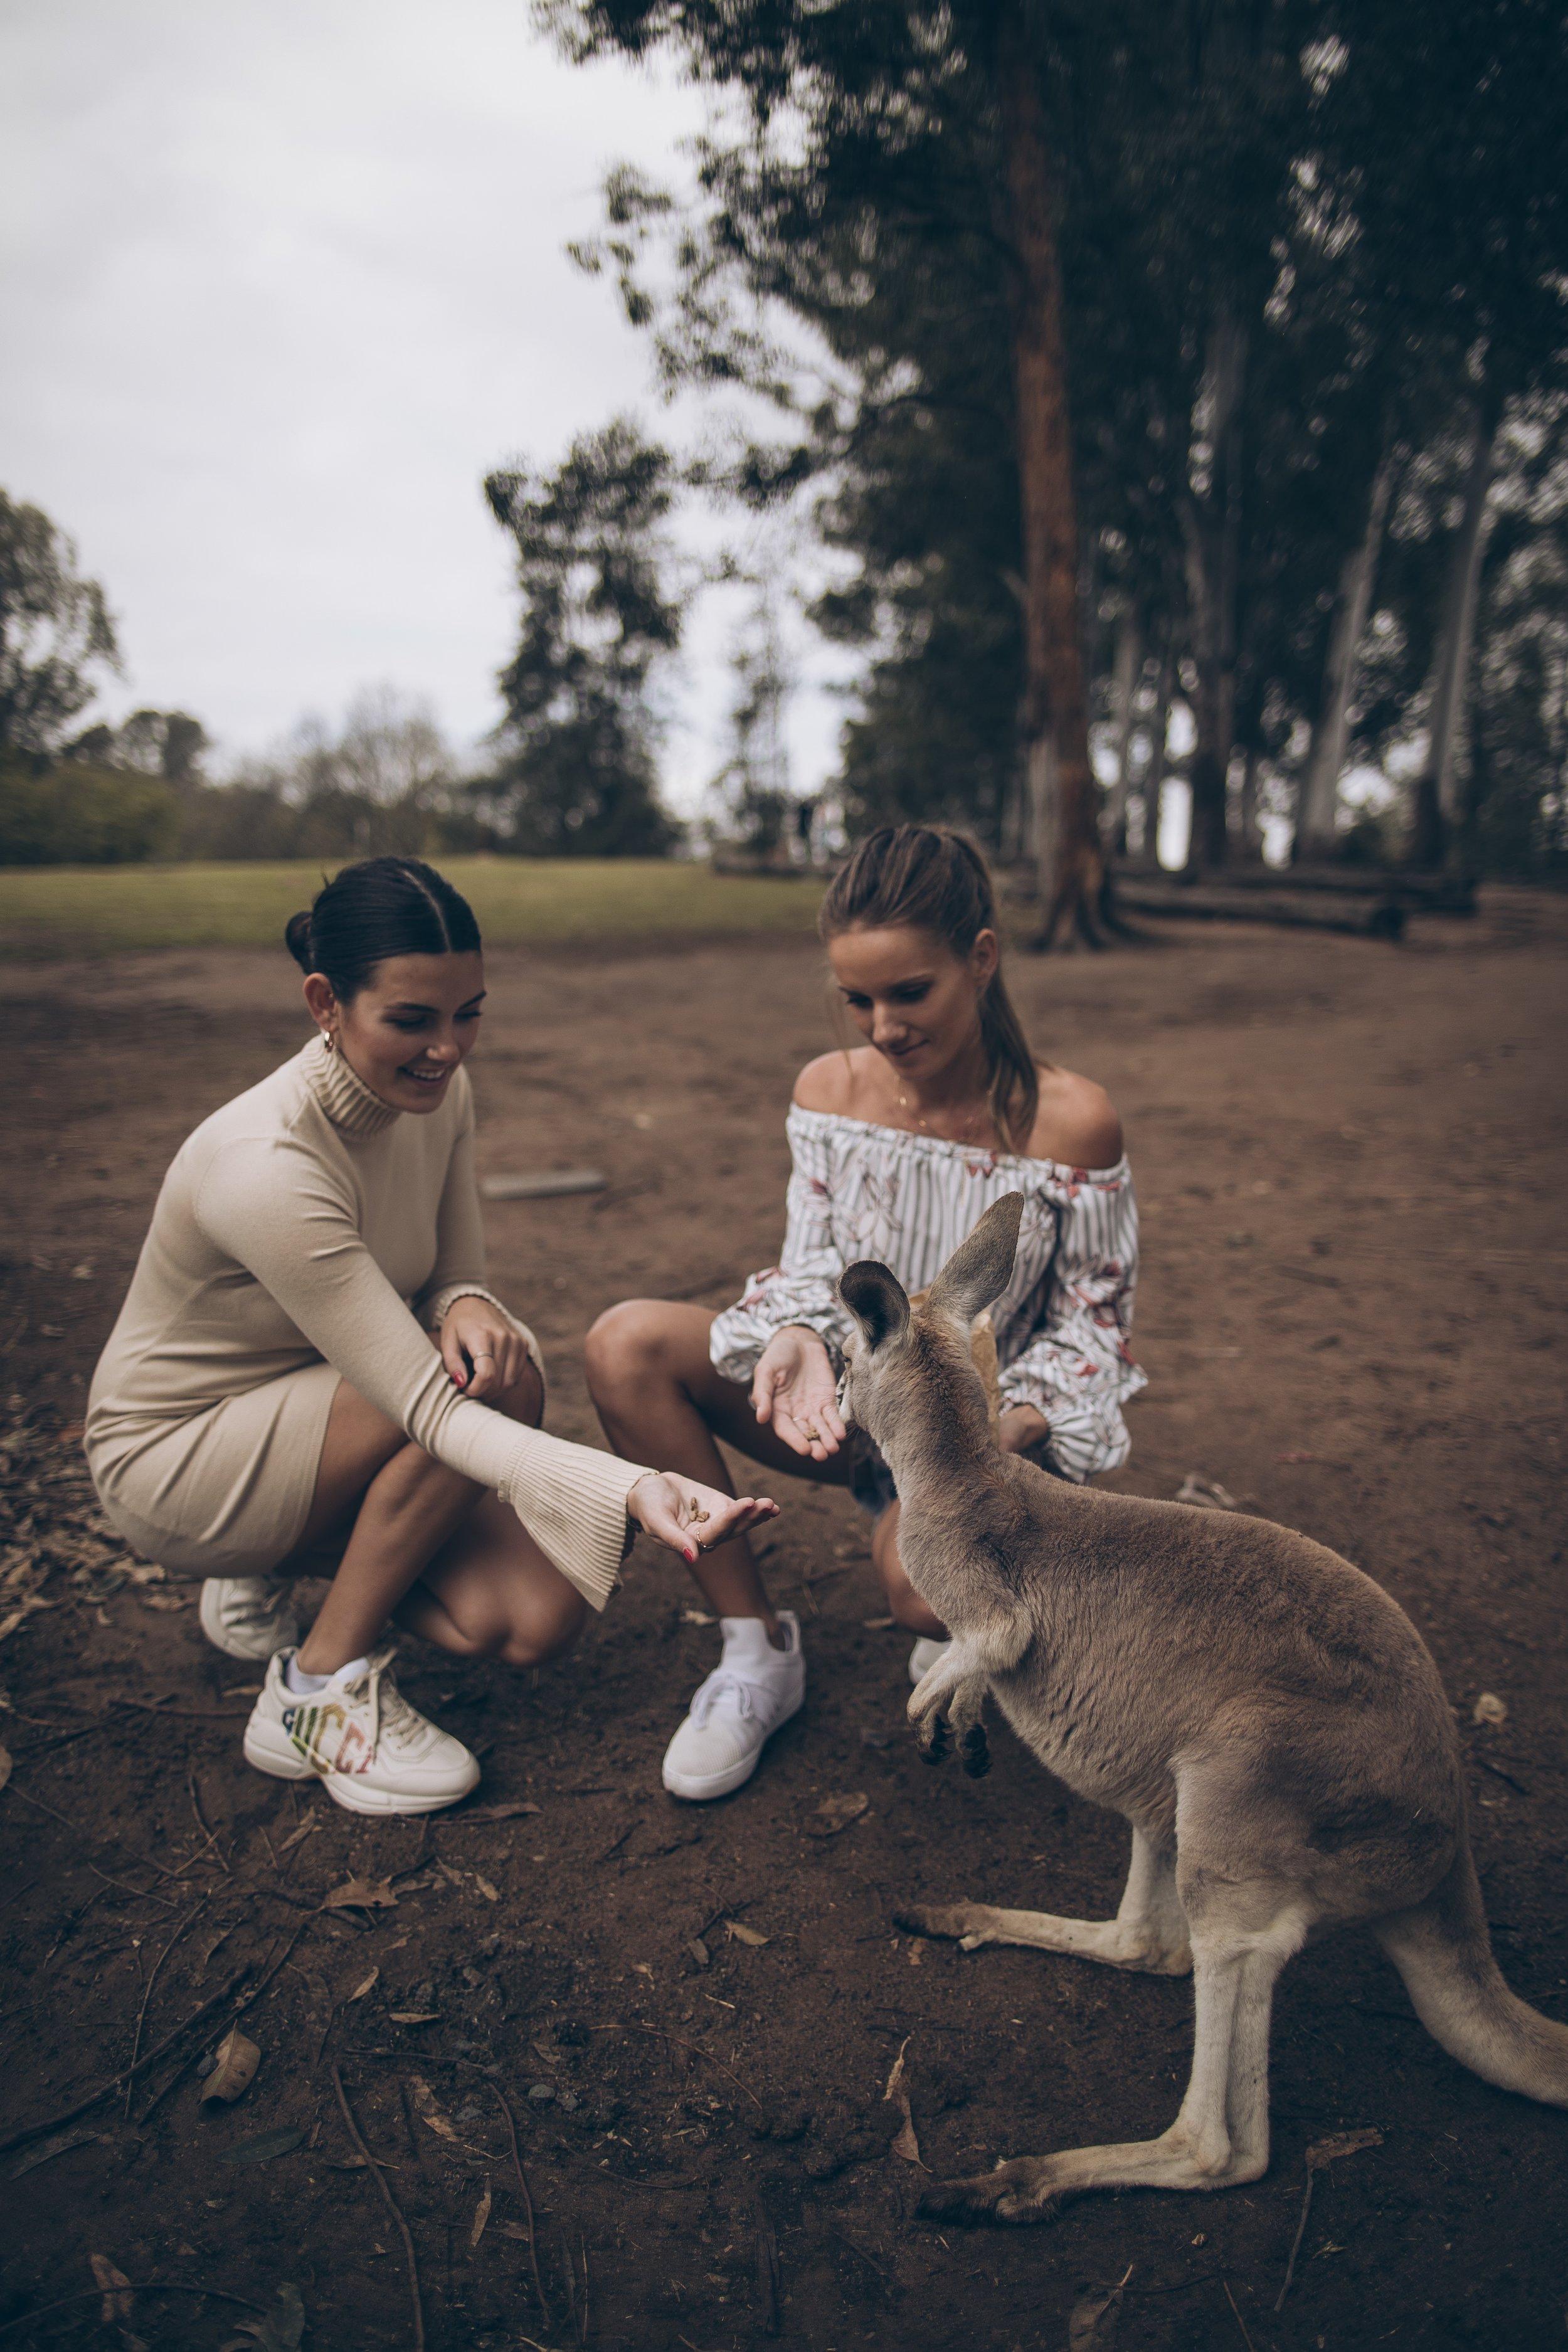 Lone Pine koala sanctuary September down under Brisbane Australia